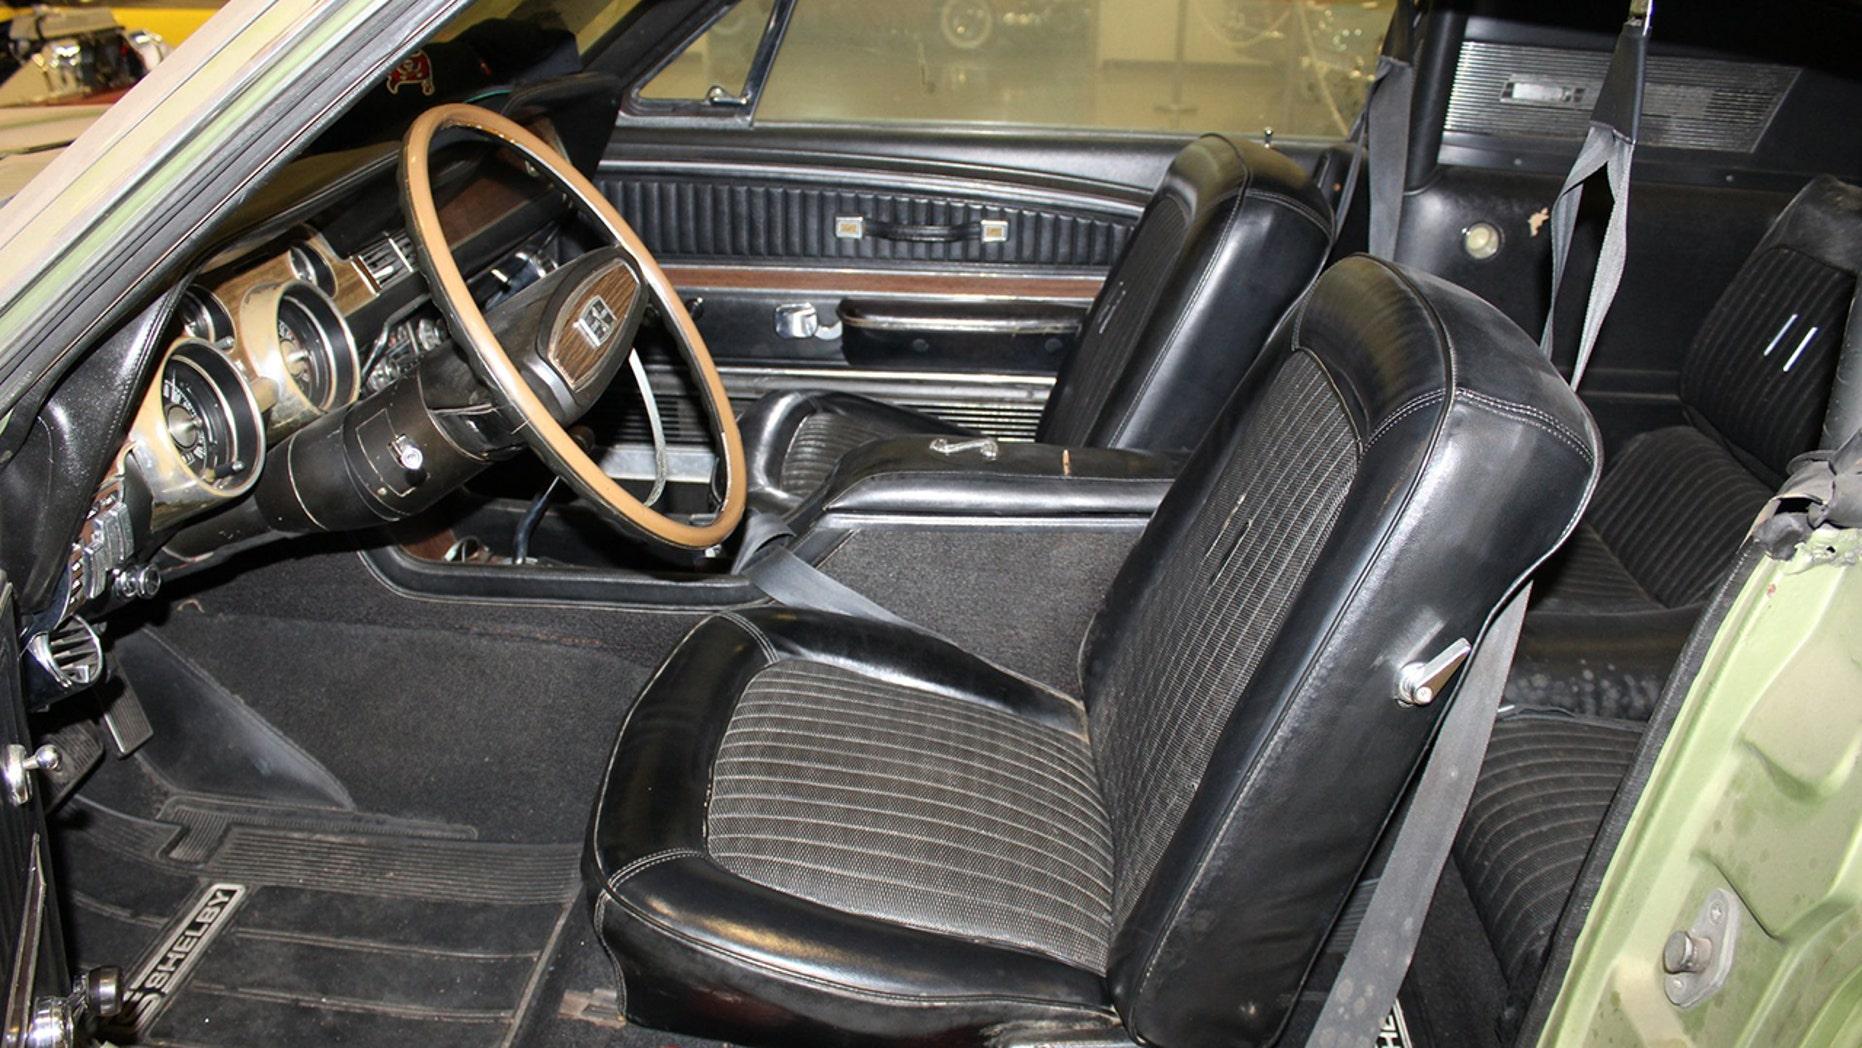 1968 Shelby GT500 interior